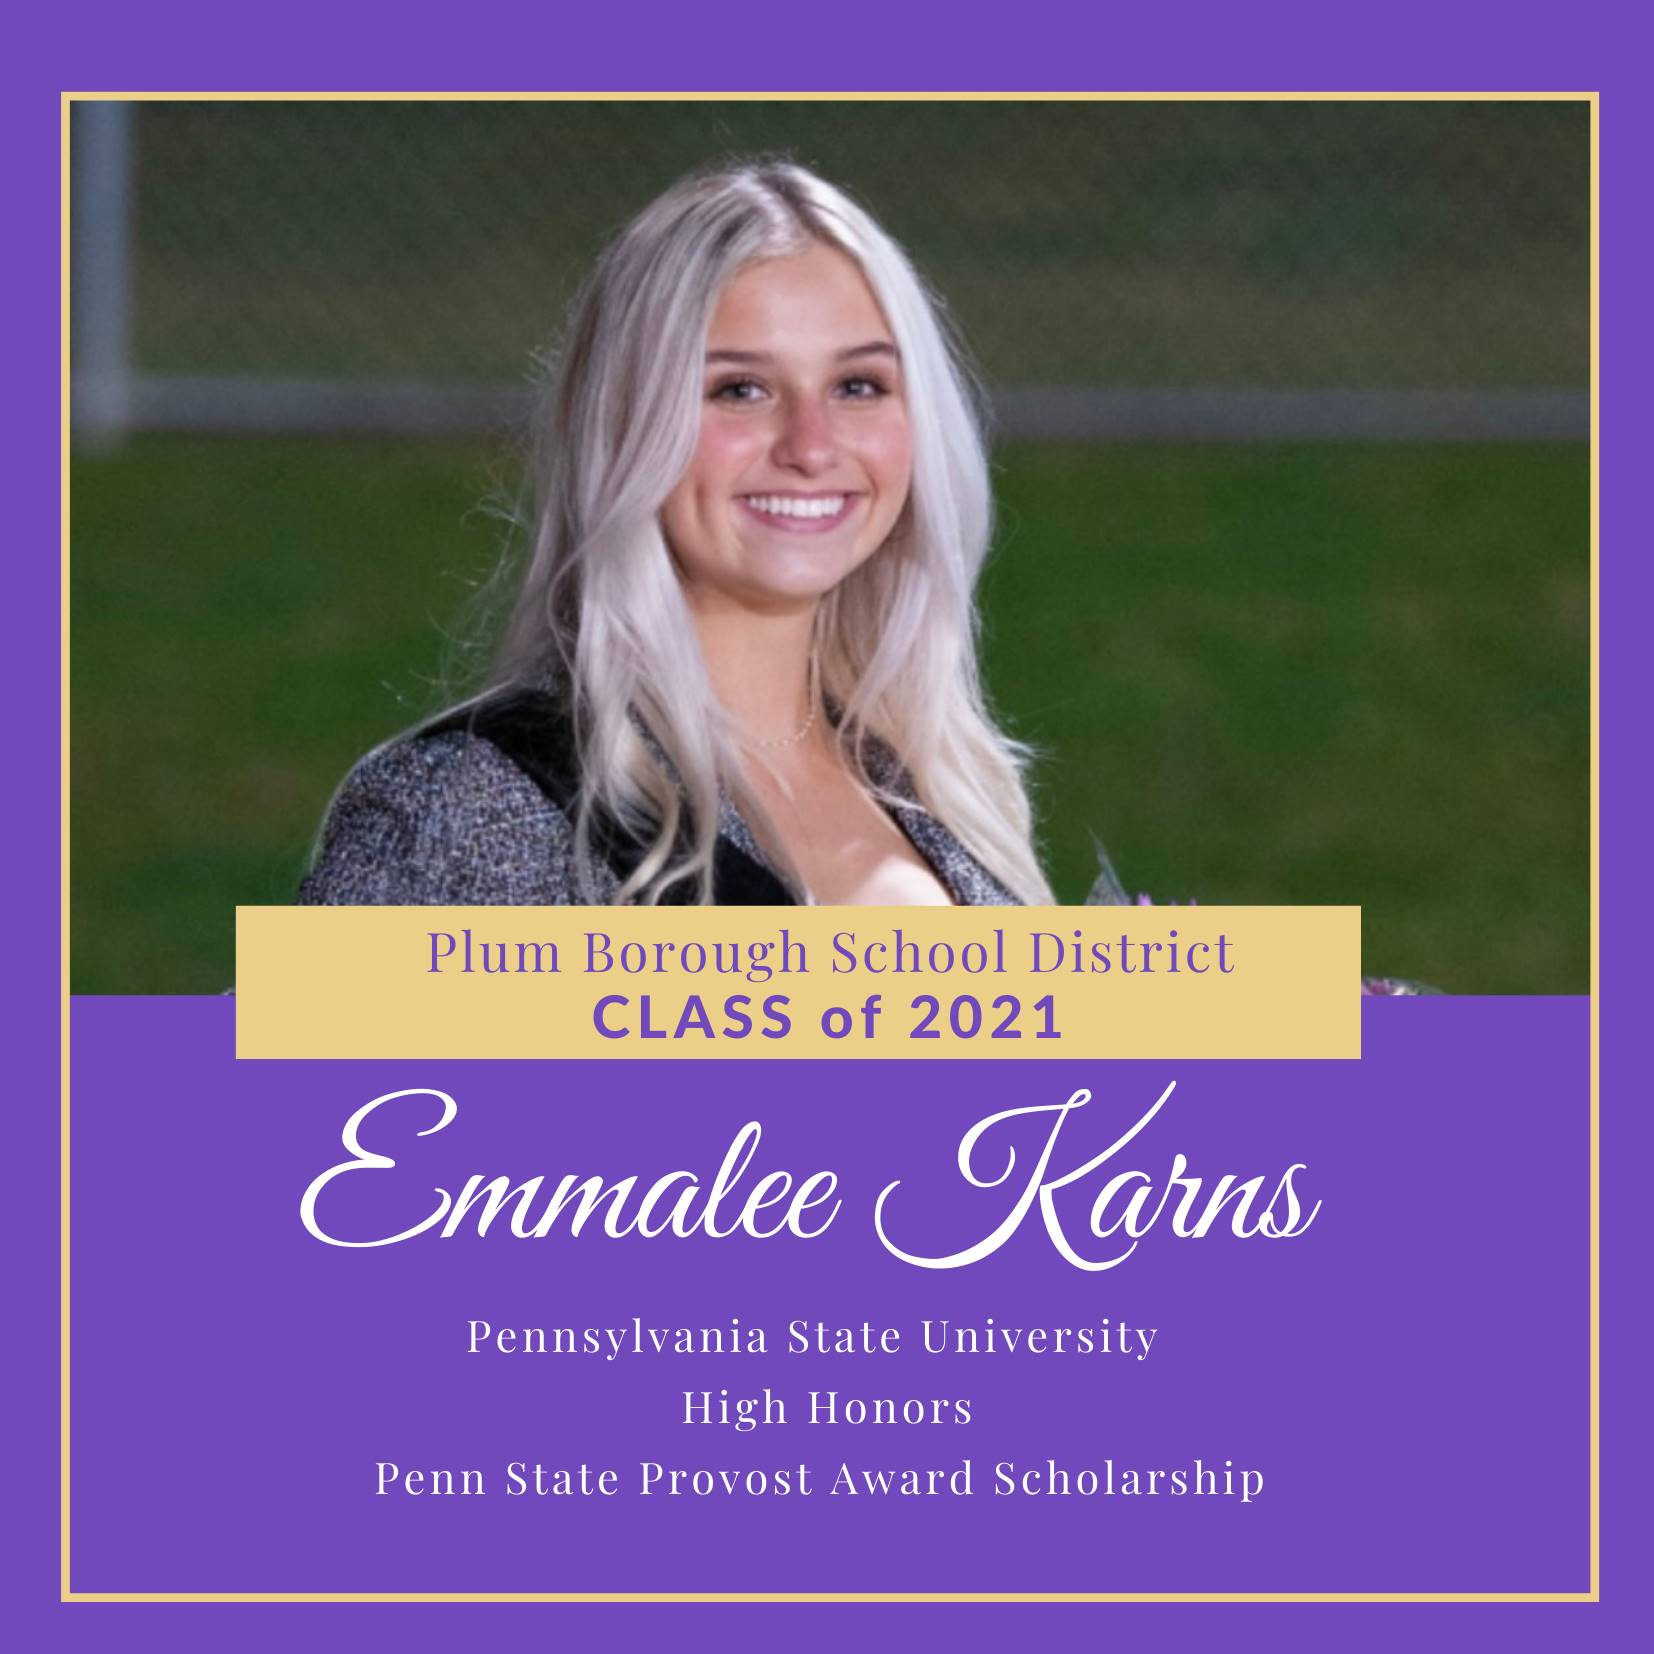 Congratulations to Emmalee Karns, Class of 2021!